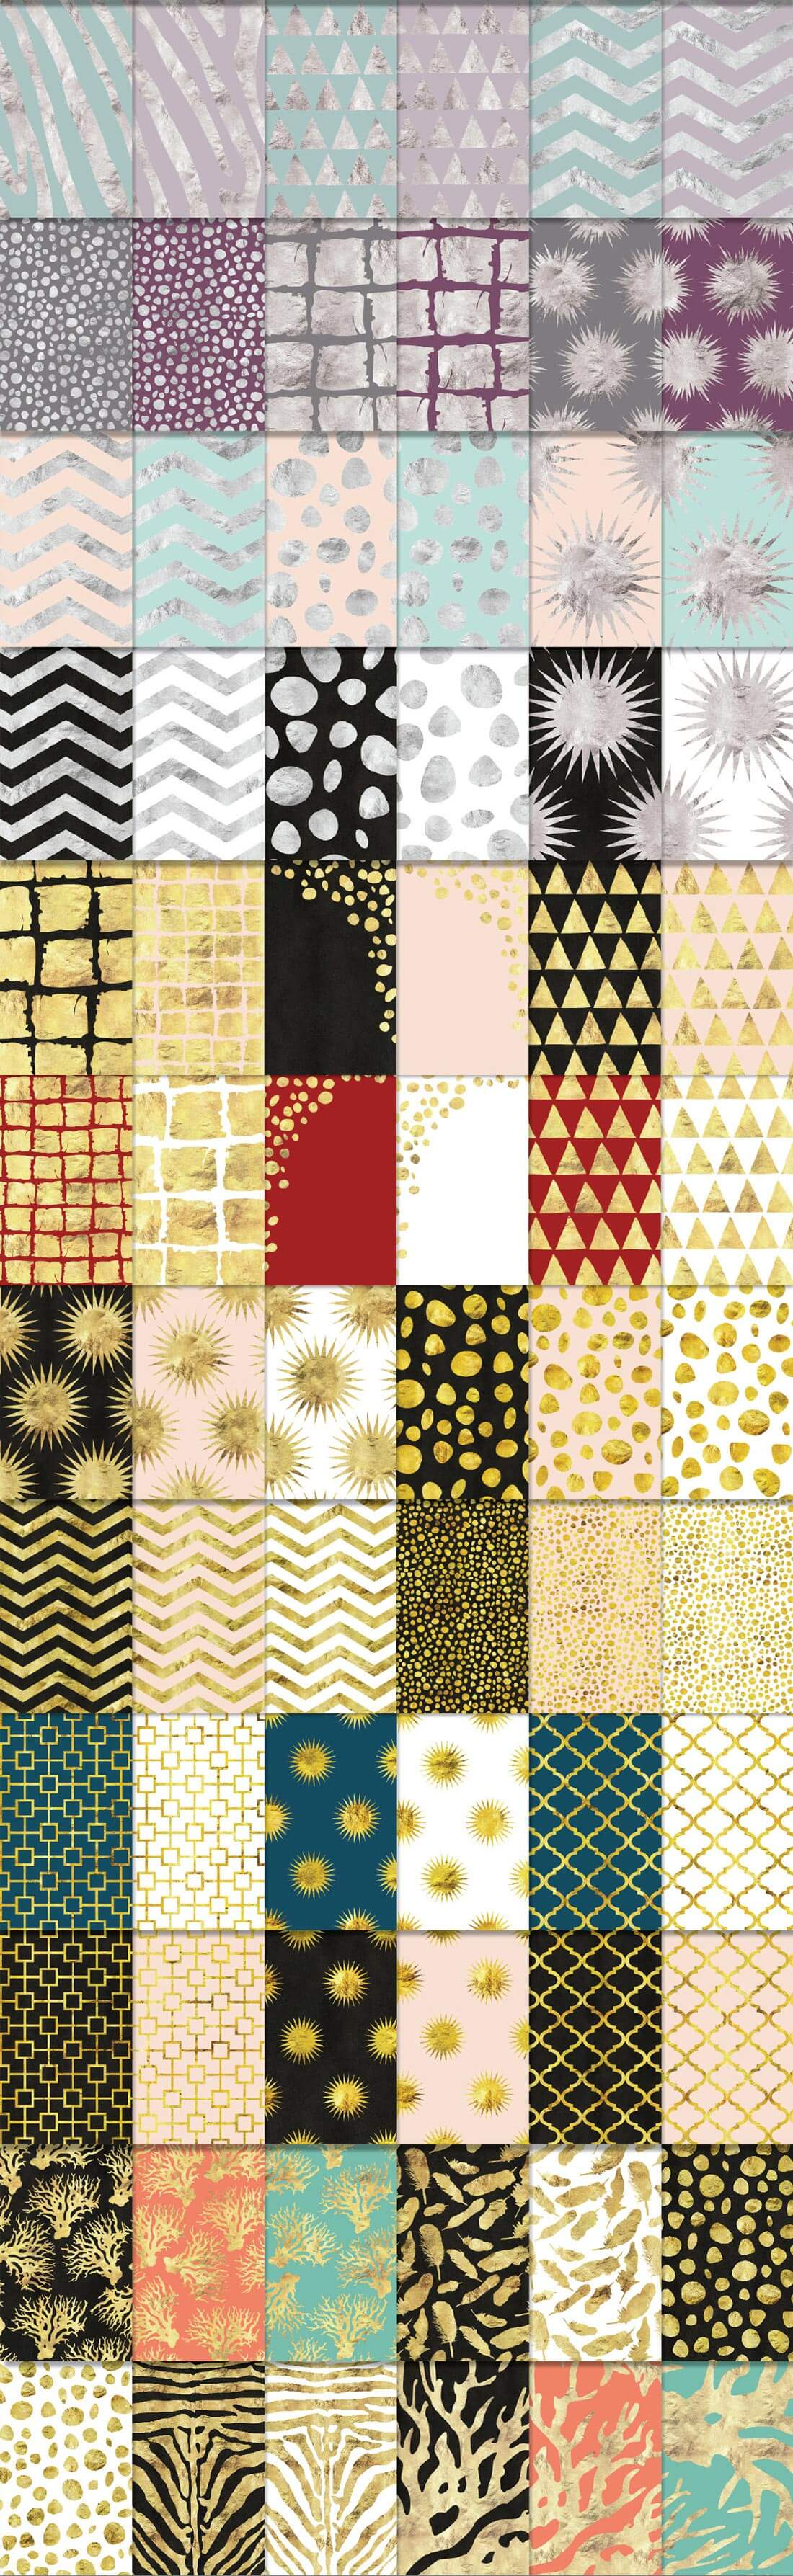 540 Geometric Patterns Super Bundle from Blixa 6 Studios - Blixa6Studios 2